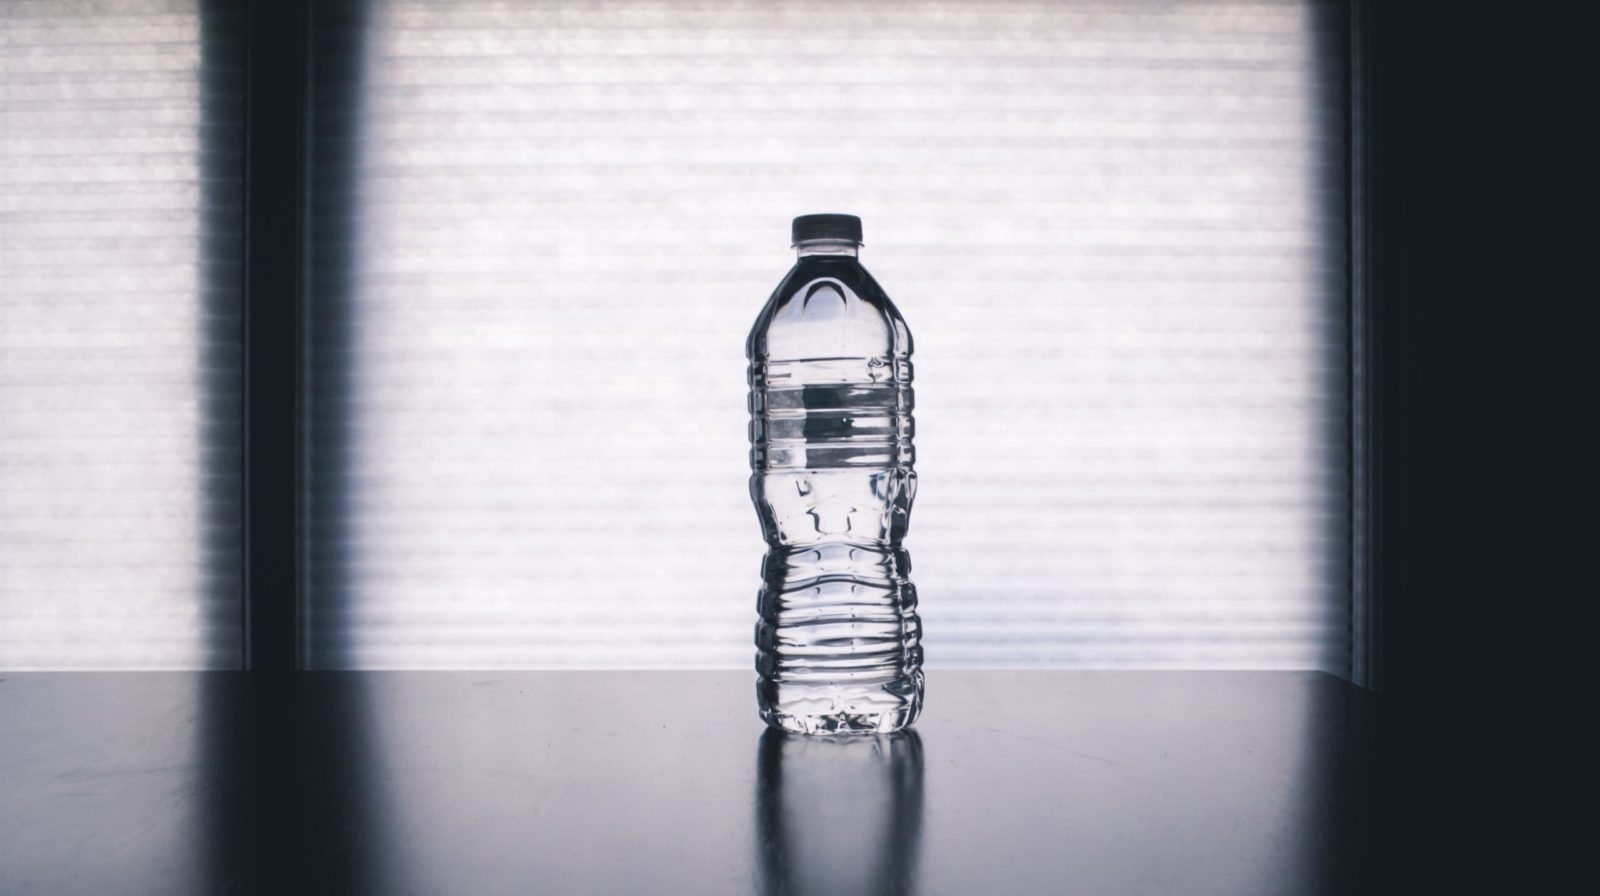 agua embotellada o de grifo